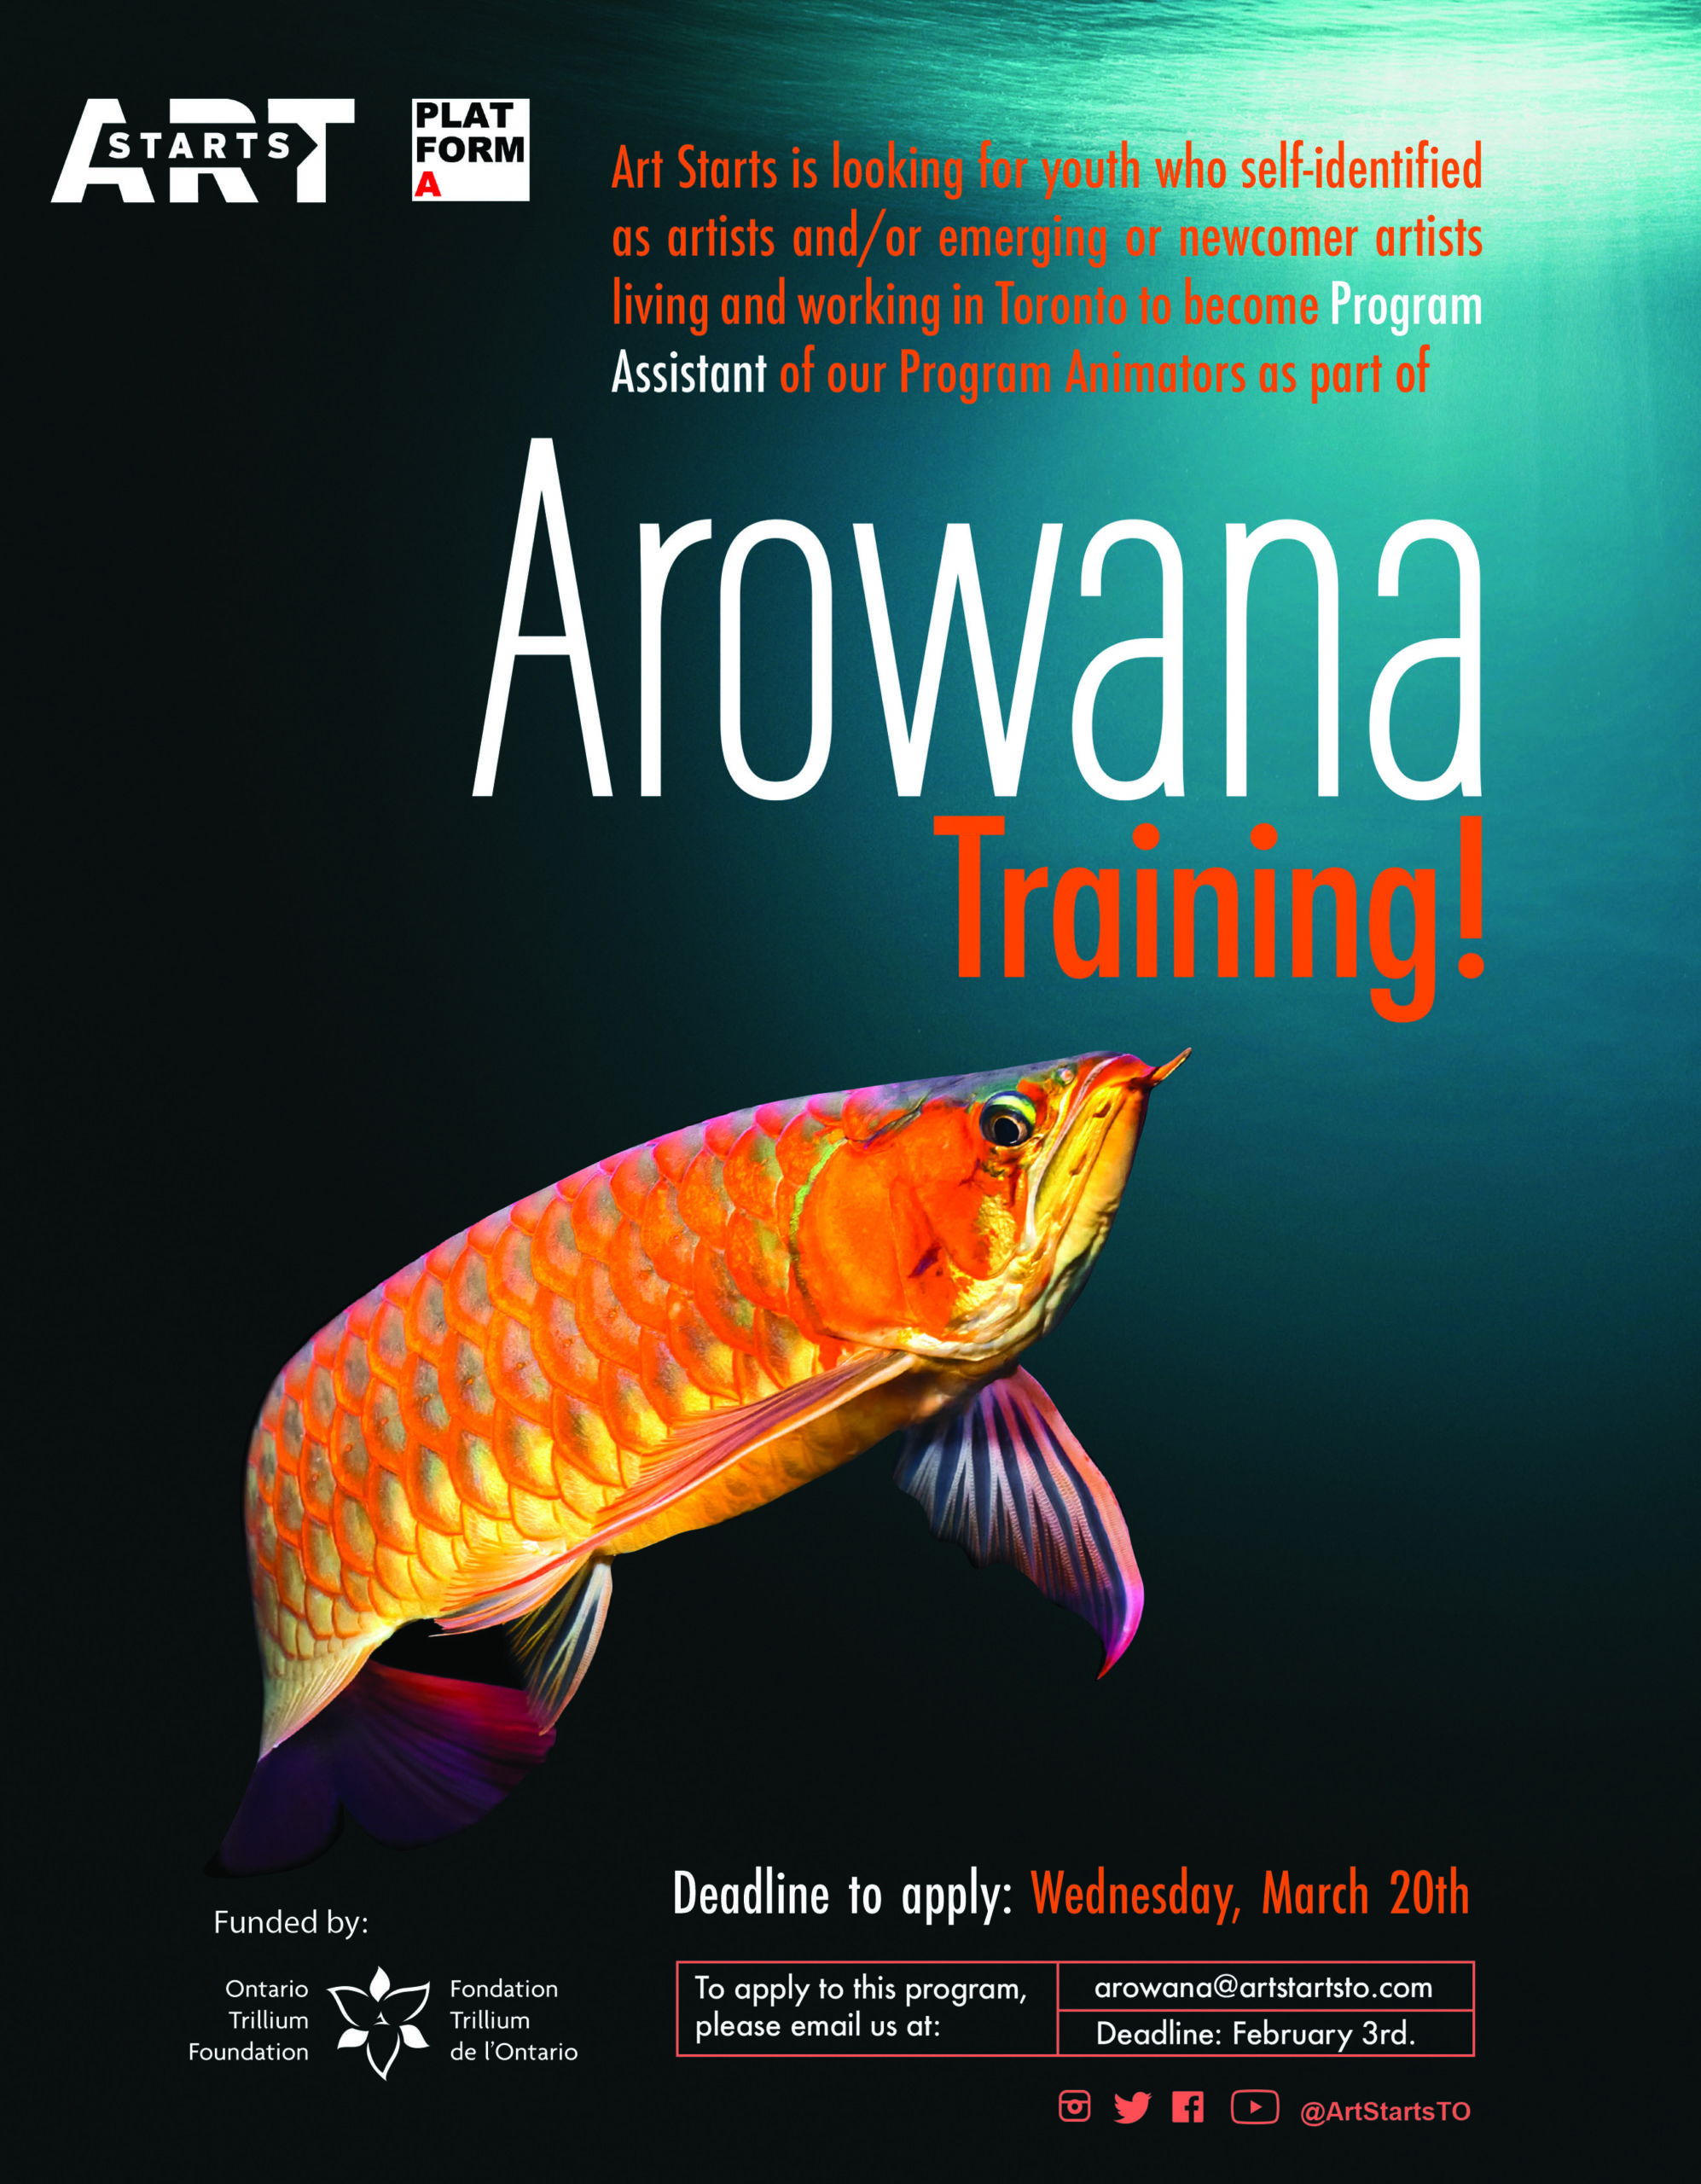 AROWANA PA final No text